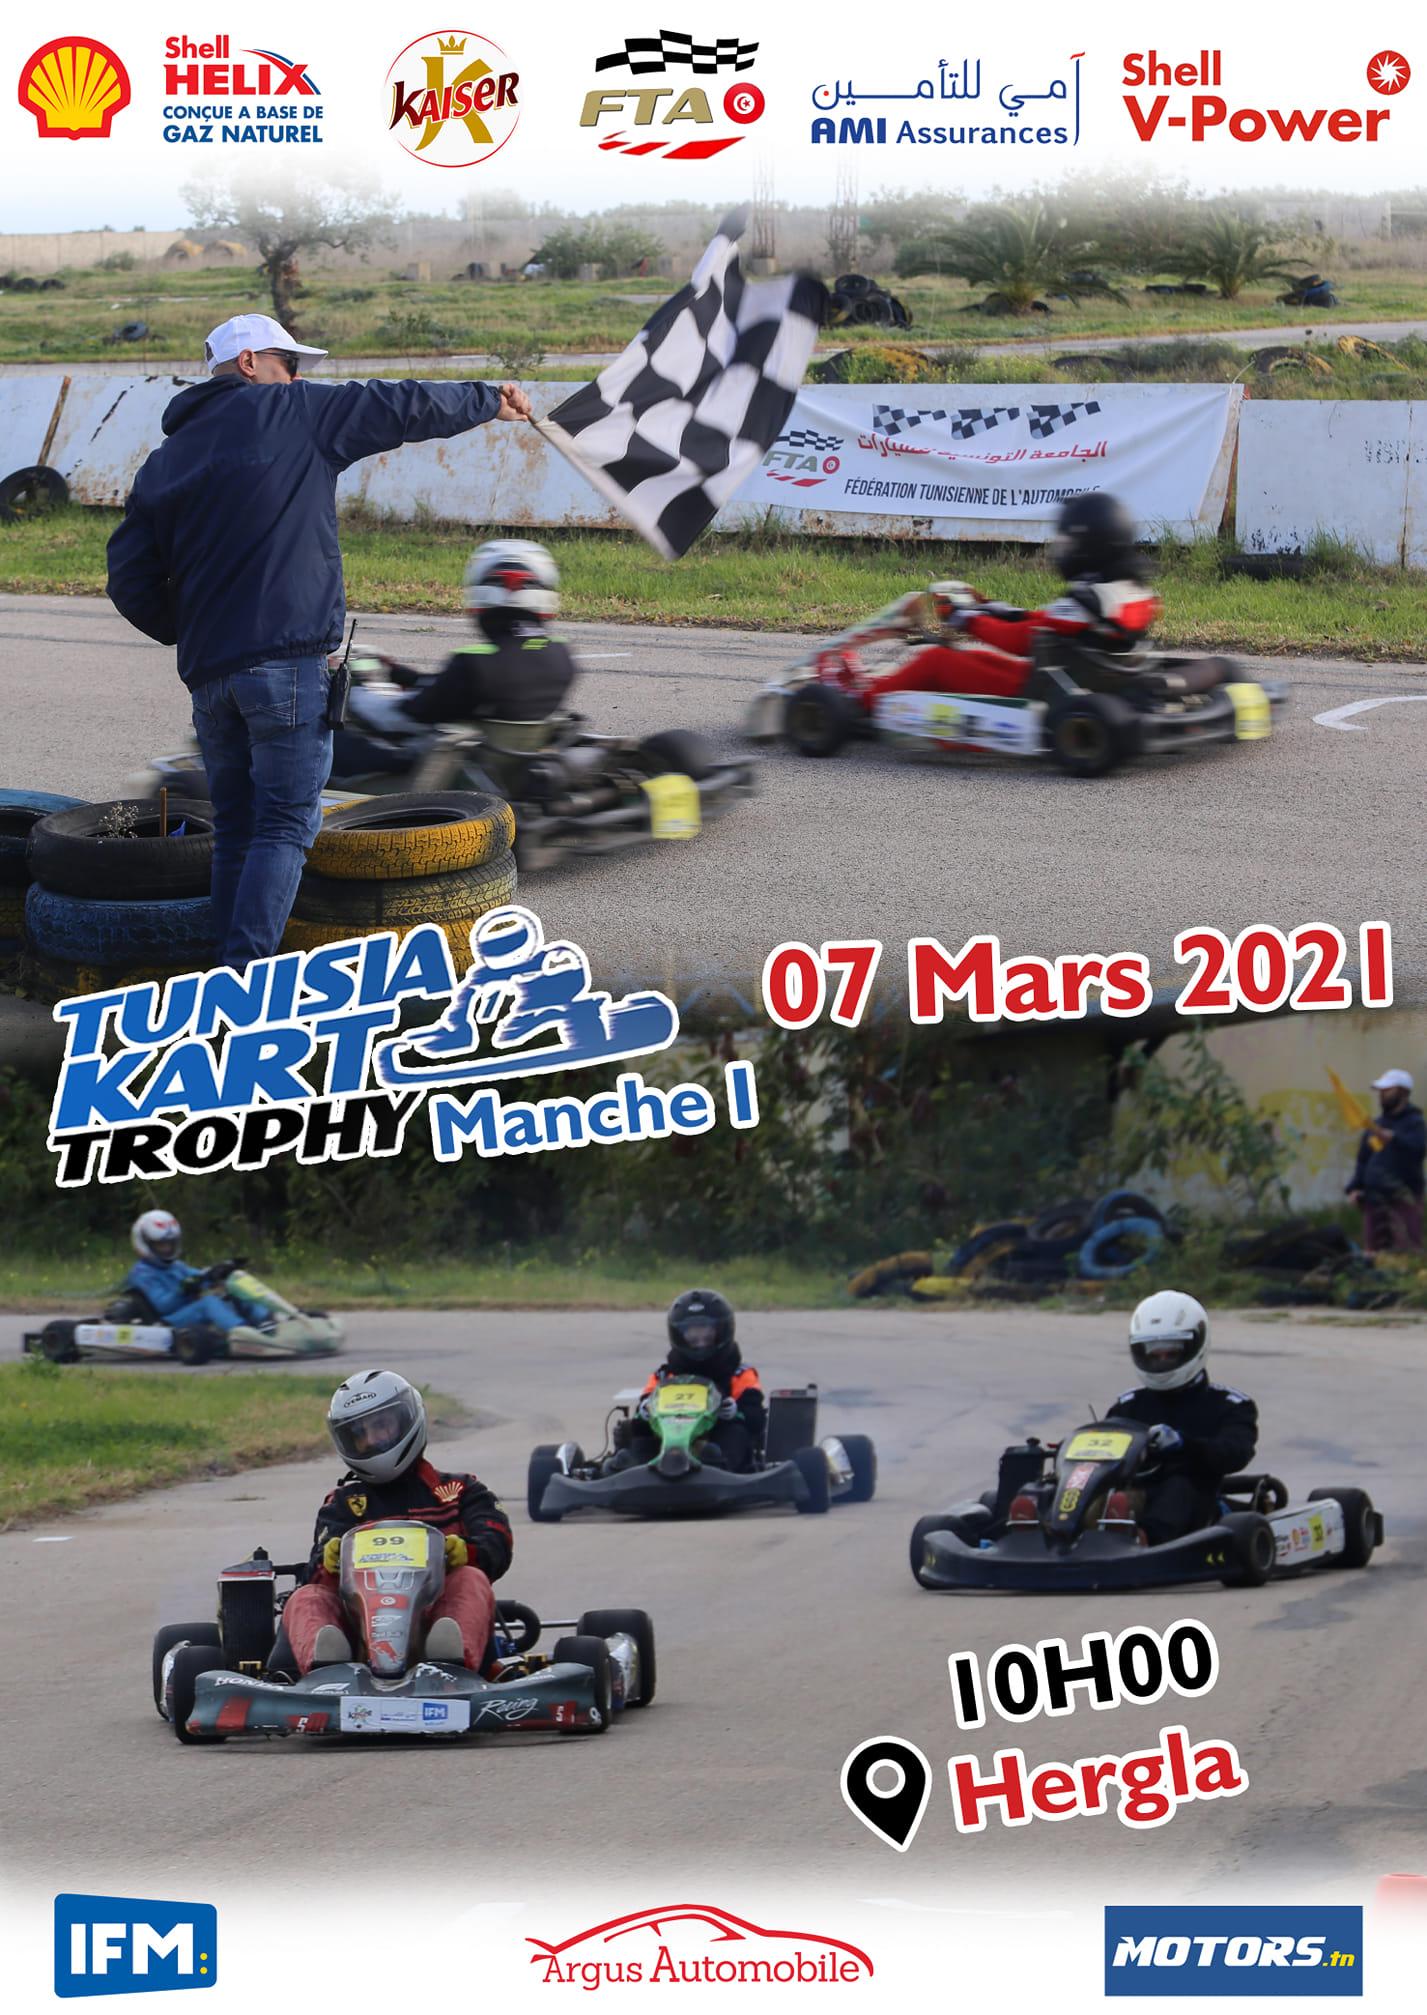 Tunisia Kart Trophy 2021 – Manche 1